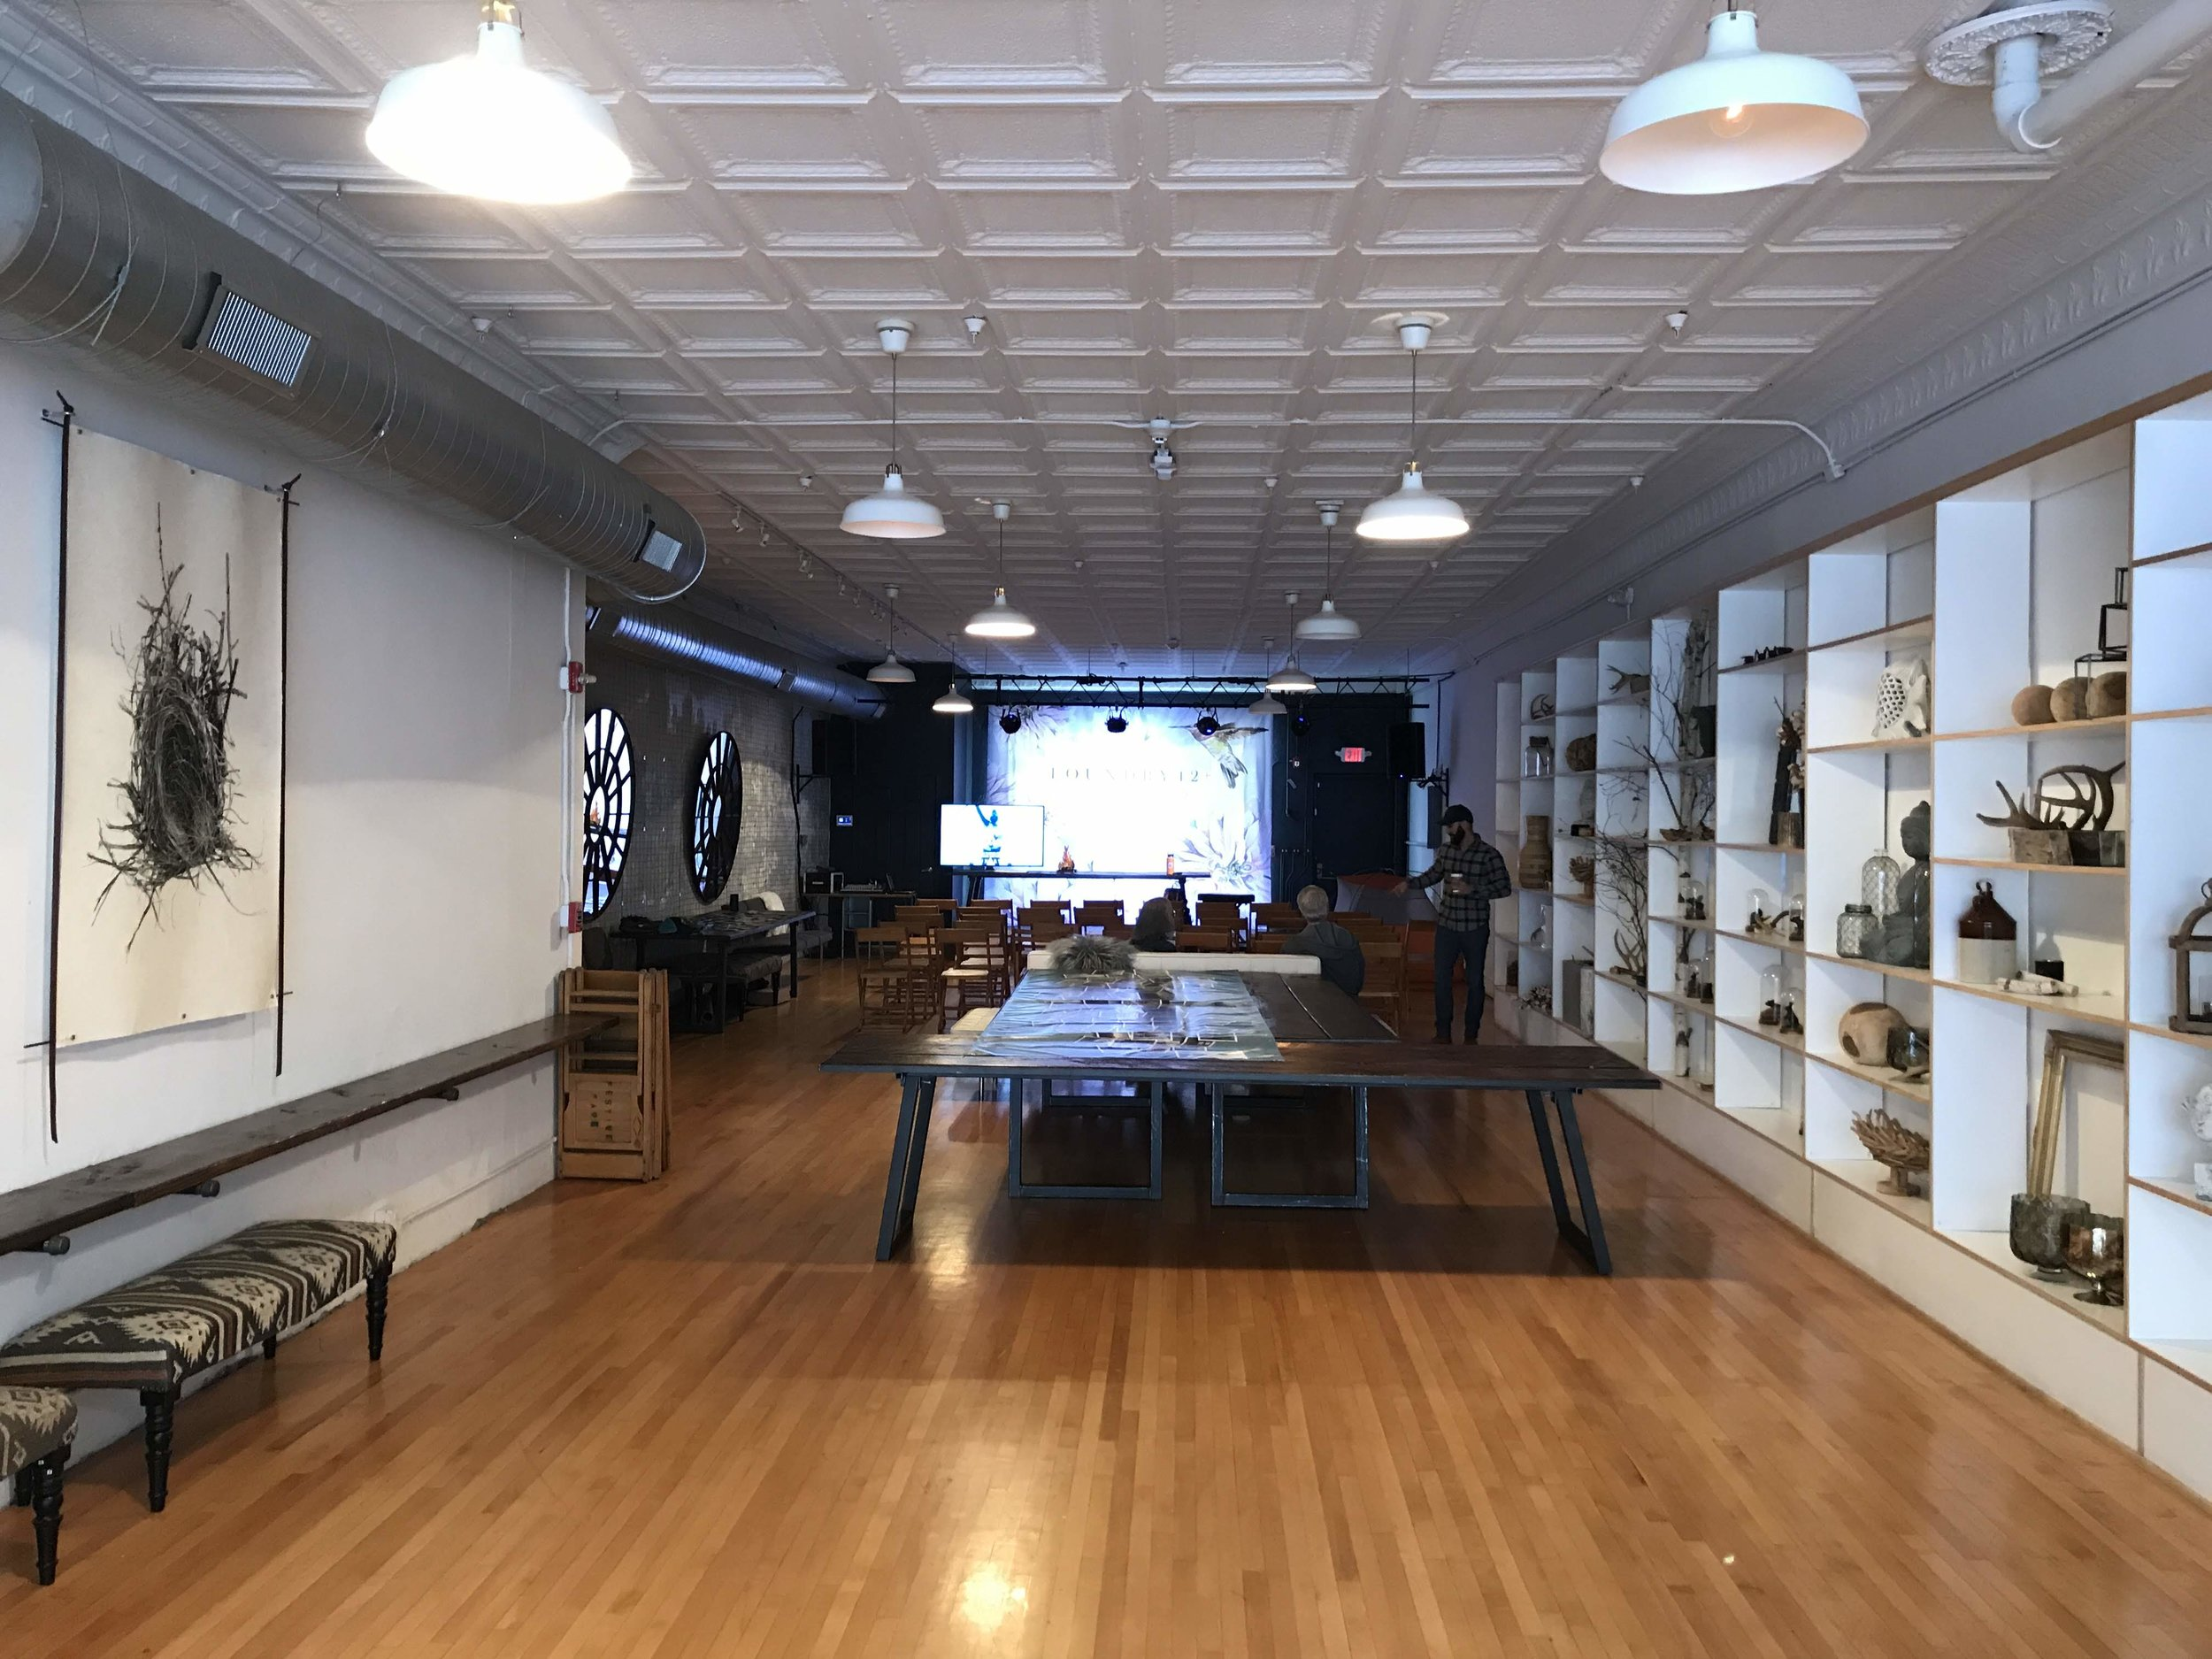 Through & Thru at Foundry42+, Port Jervis, NY